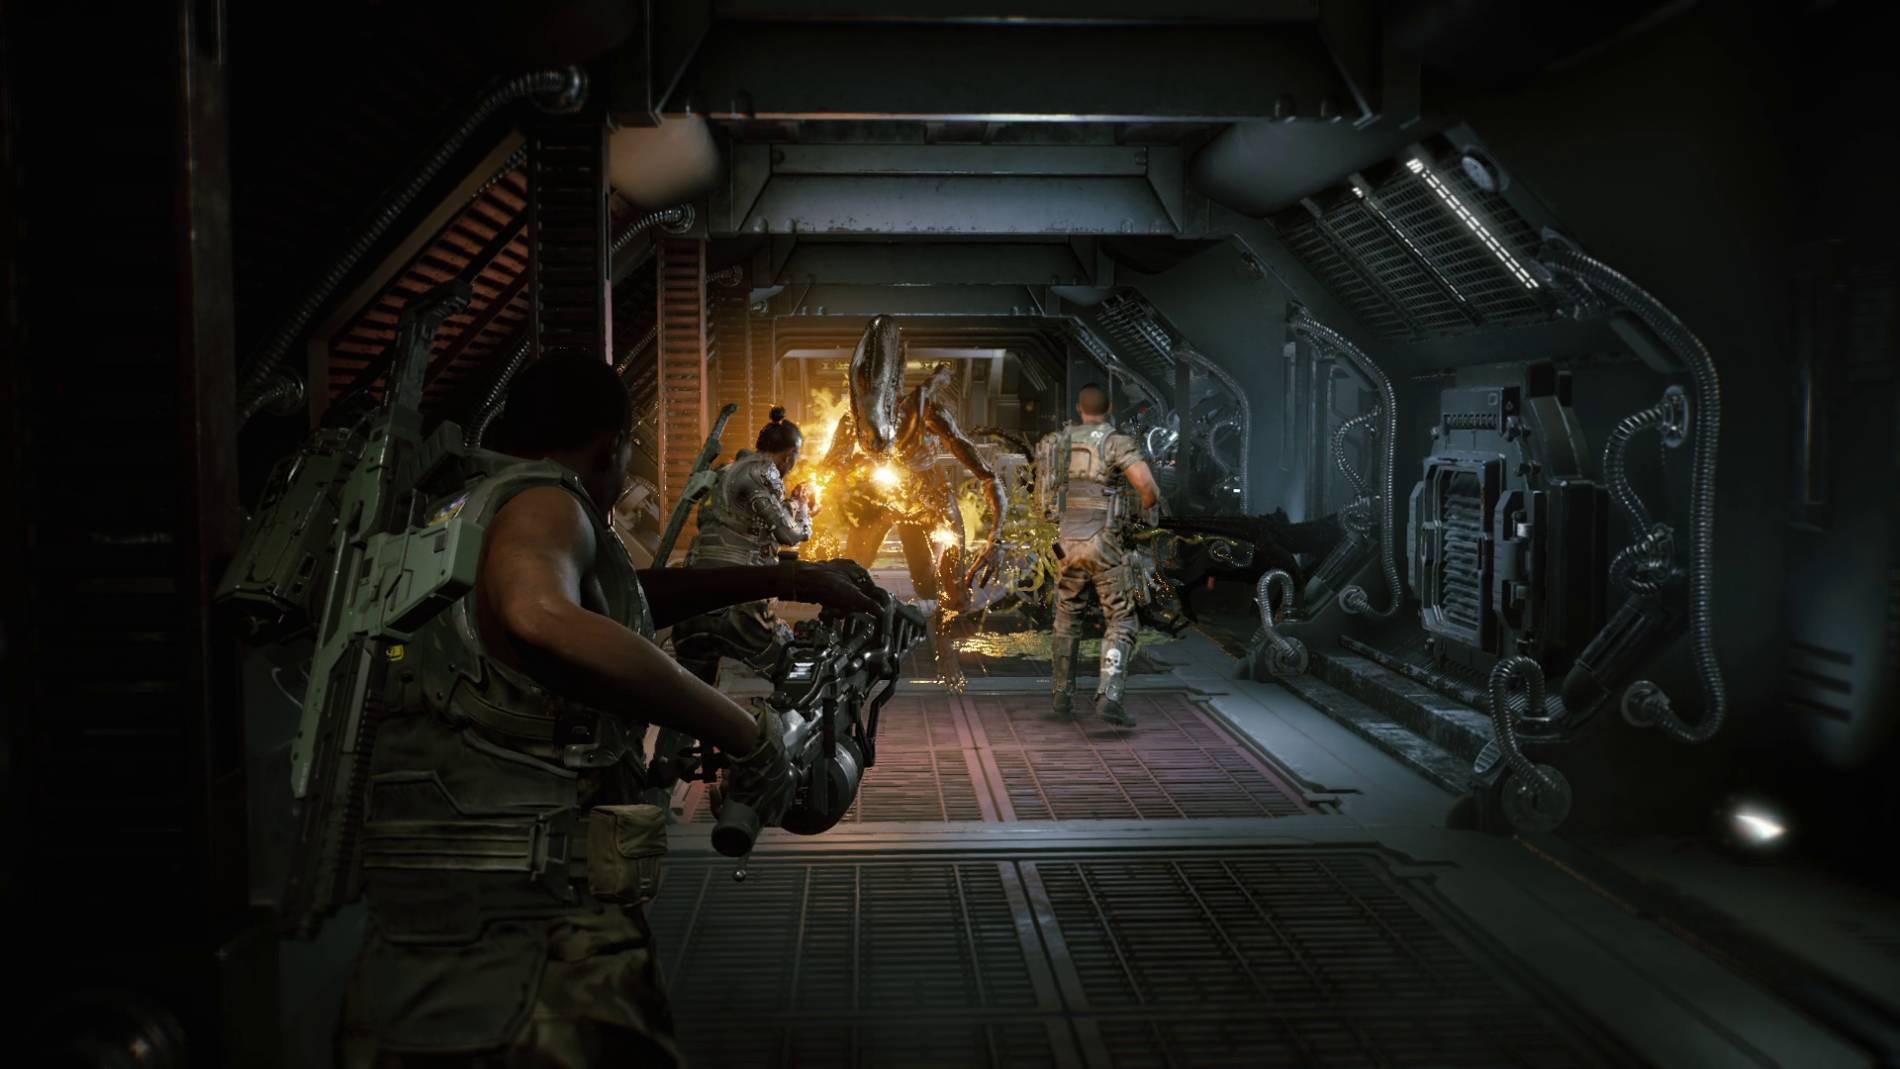 Cold Iron анонсировала кооперативный шутер Aliens: Fireteam 3